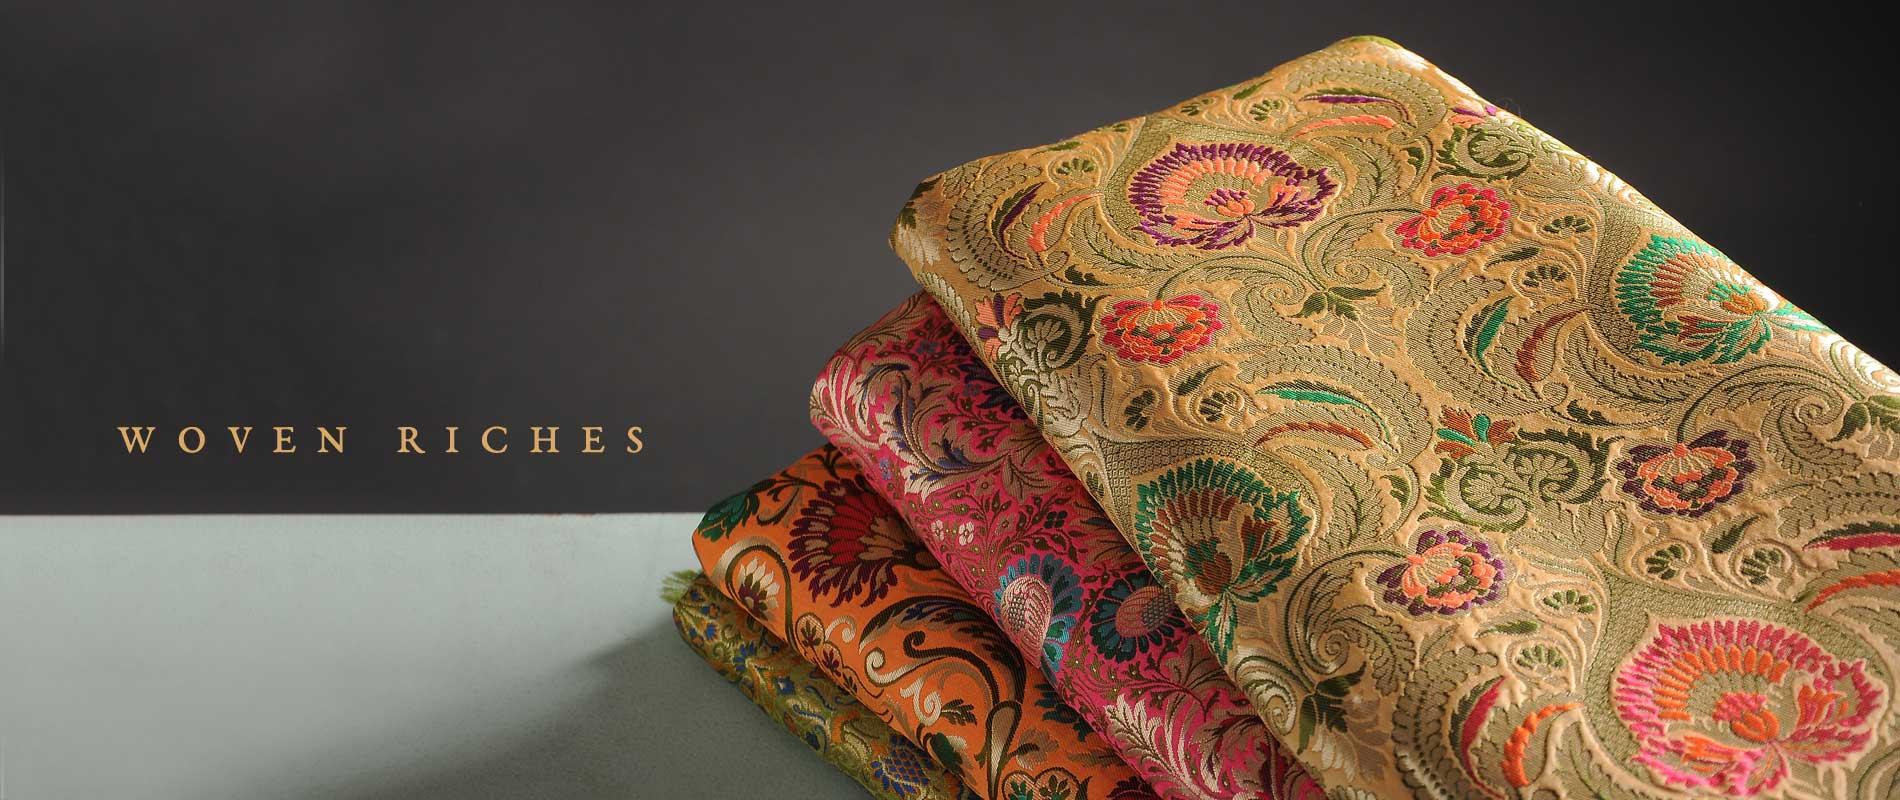 171102SRK028_SRK_Surekha_Overseas_Fabric_7988